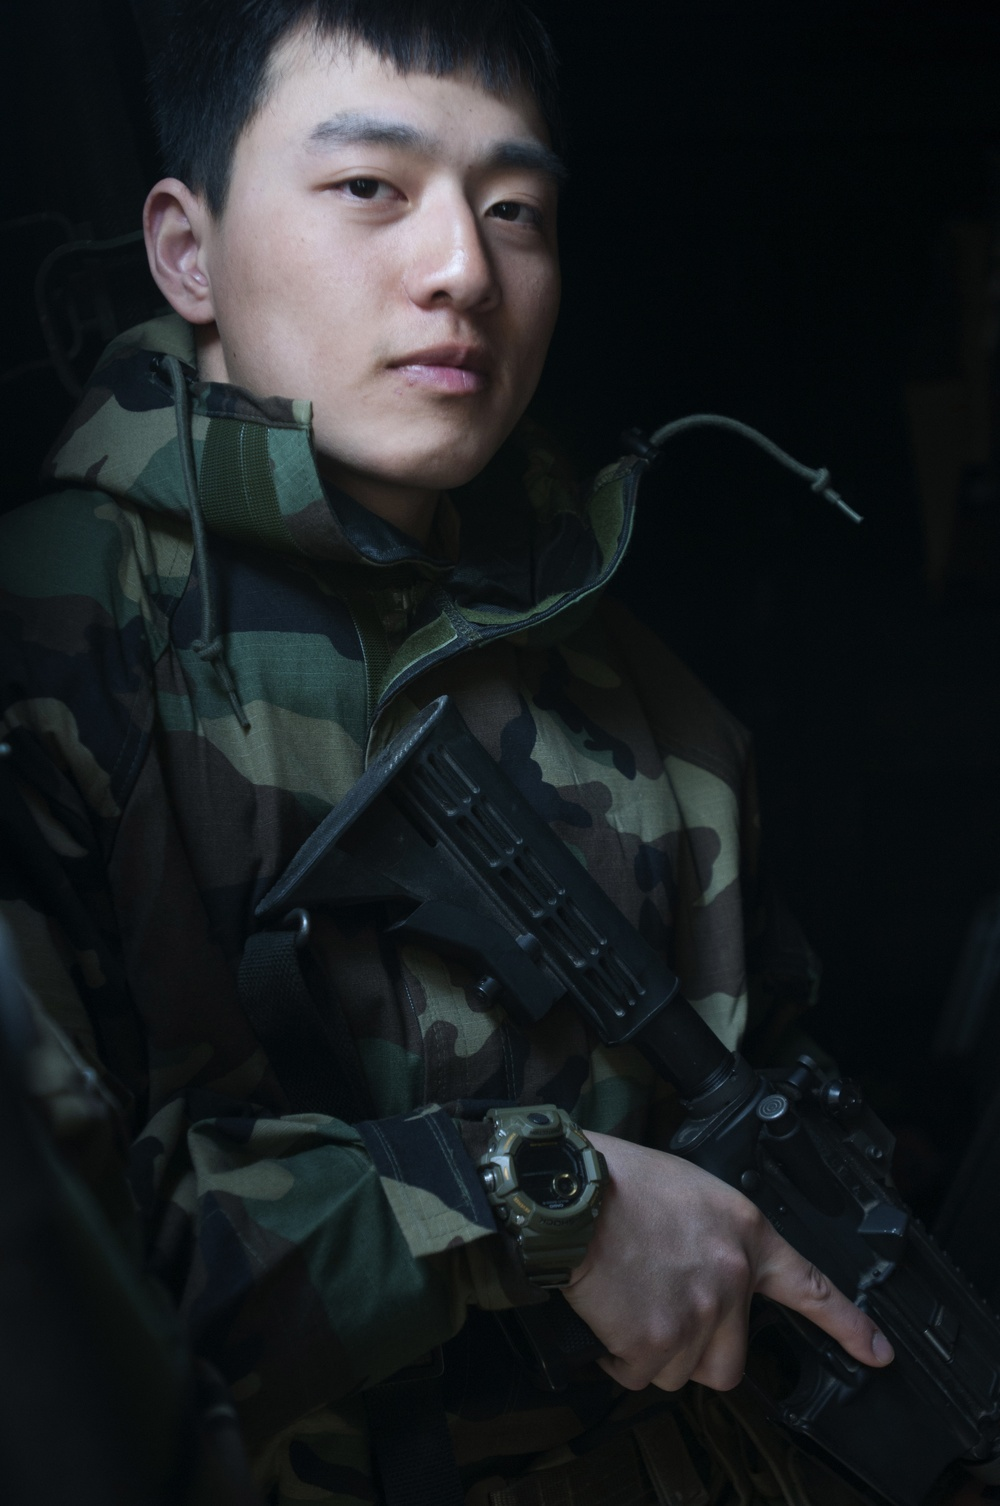 Designated Army Reserve Ready Force x units set to shape future battlefields